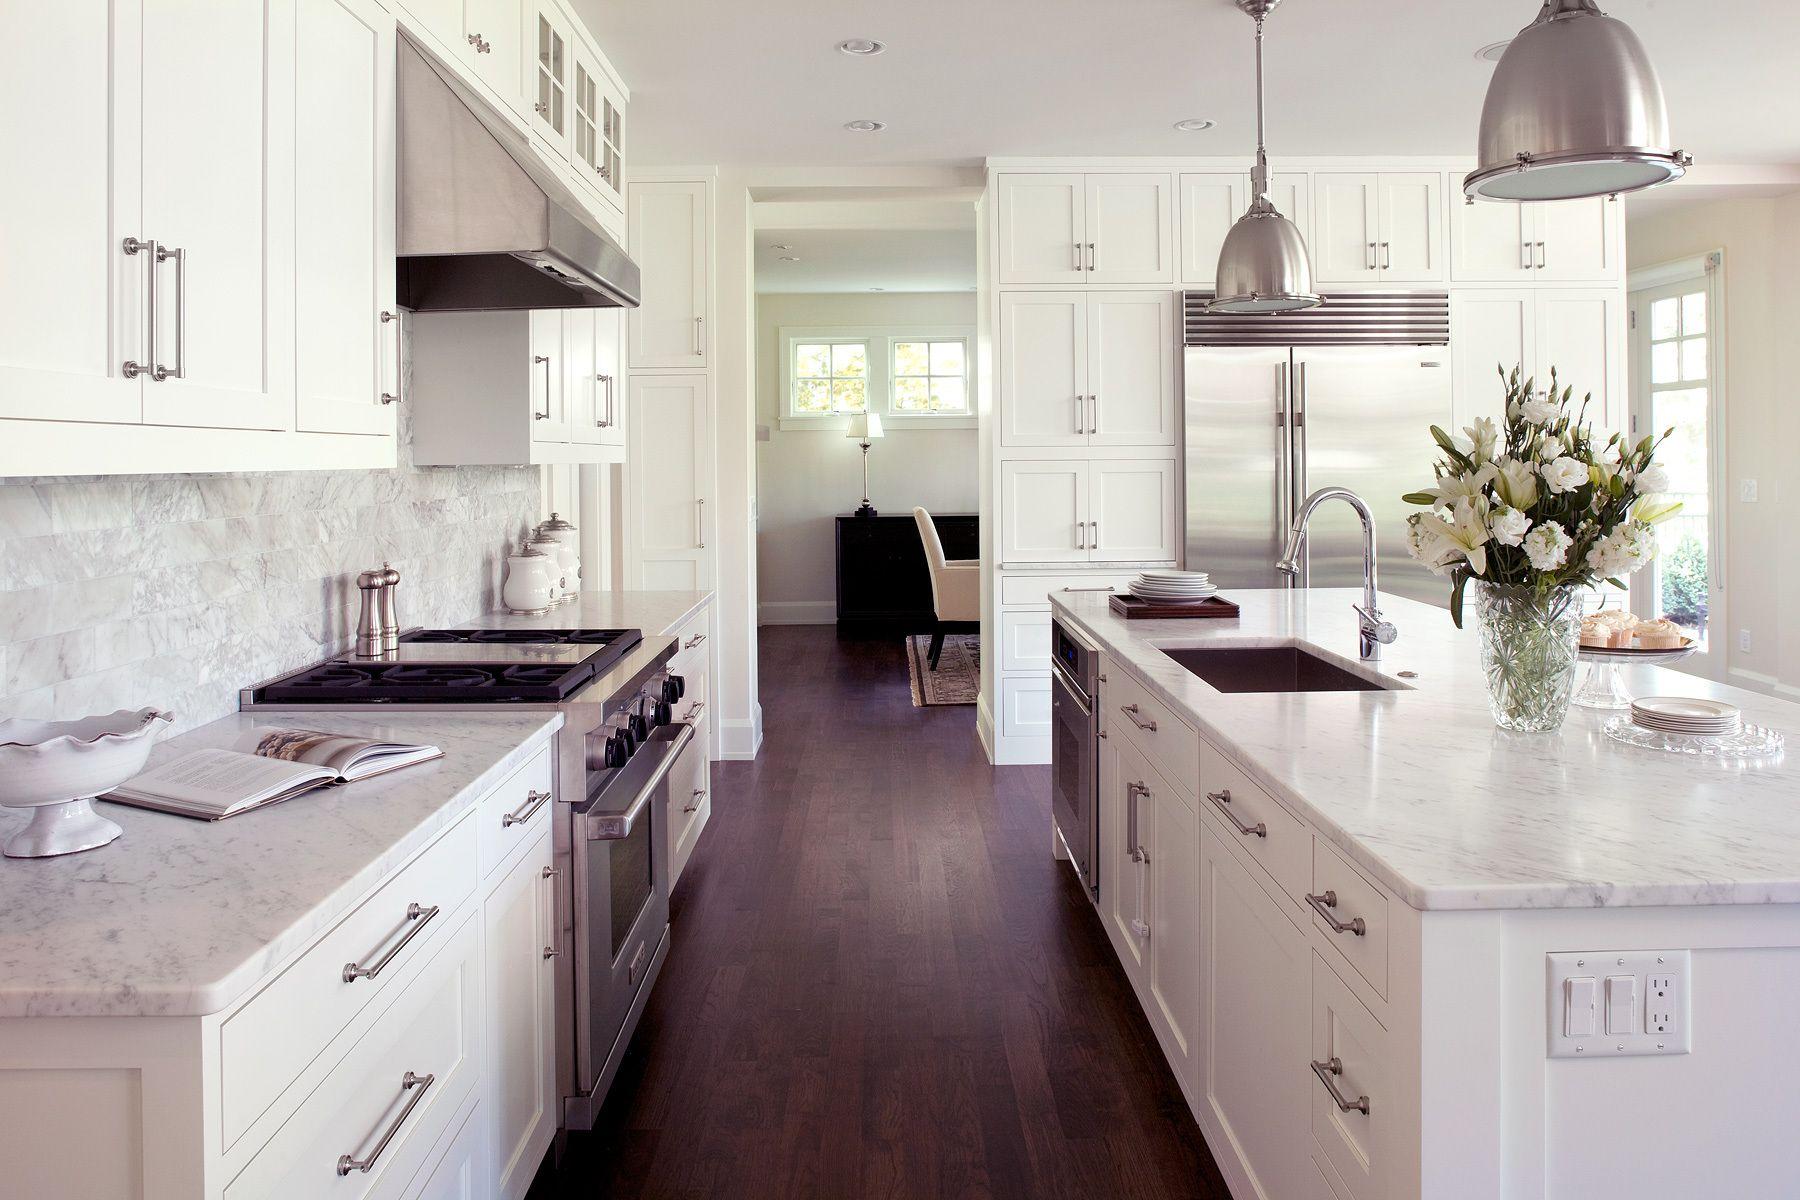 1streeter_white_kitchen_marble_counter.jpg